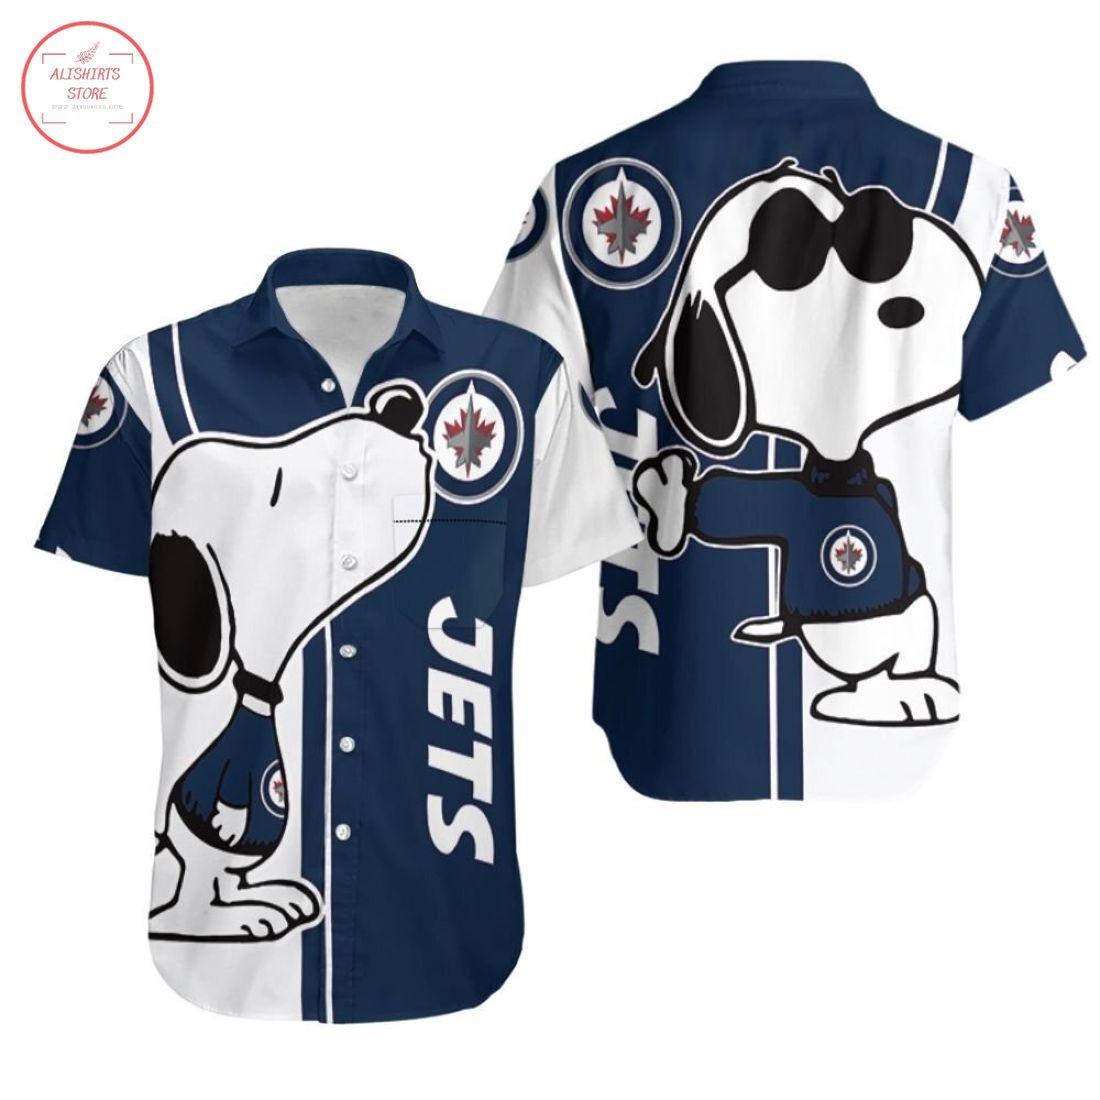 Winnipeg Jets Snoopy Hawaiian shirt